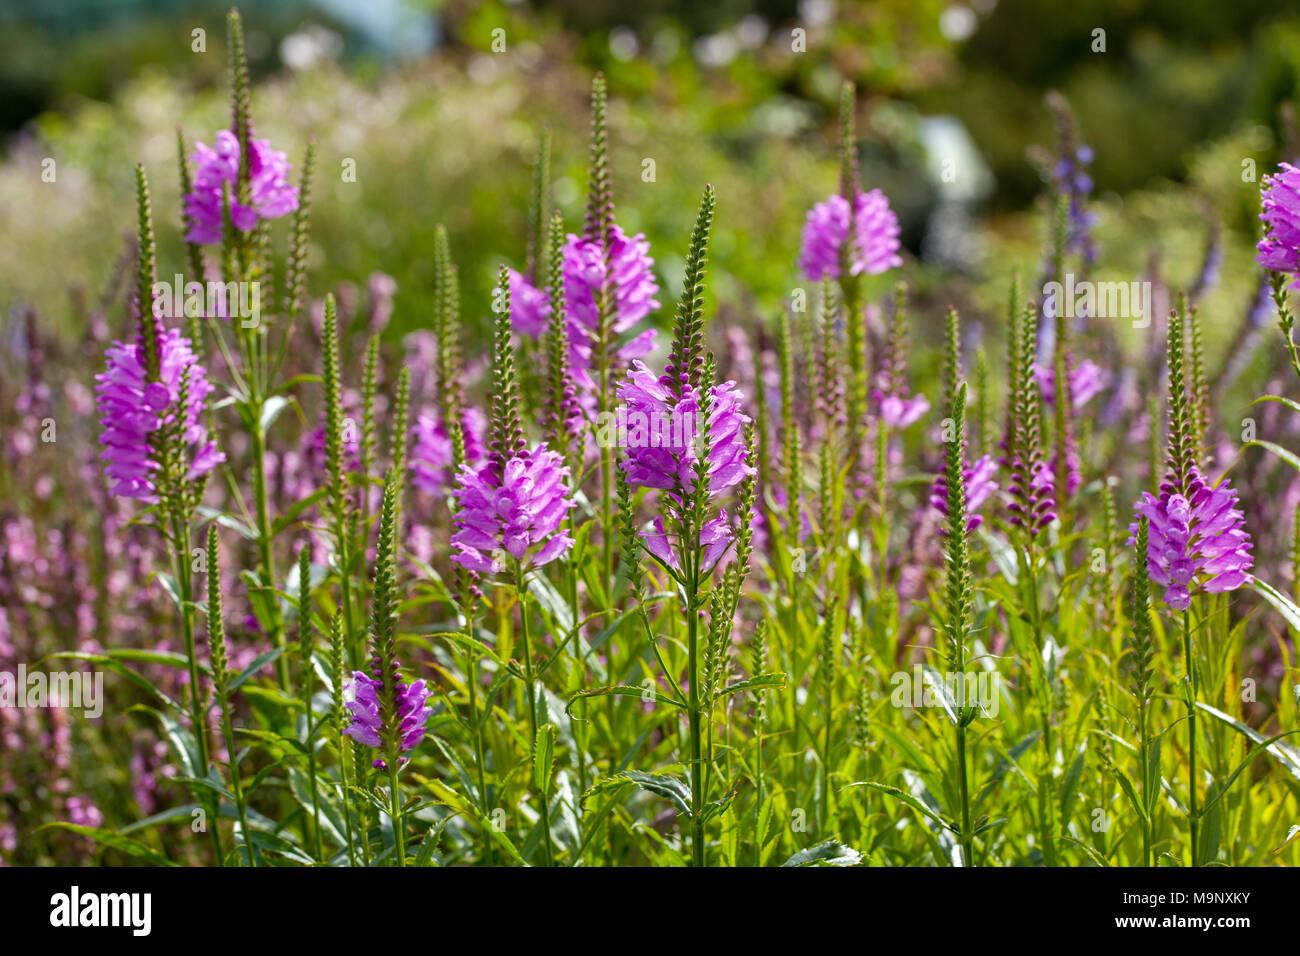 'Bouquet Rose' Obedient plant, Drakmynta (Physostegia virginiana) - Stock Image